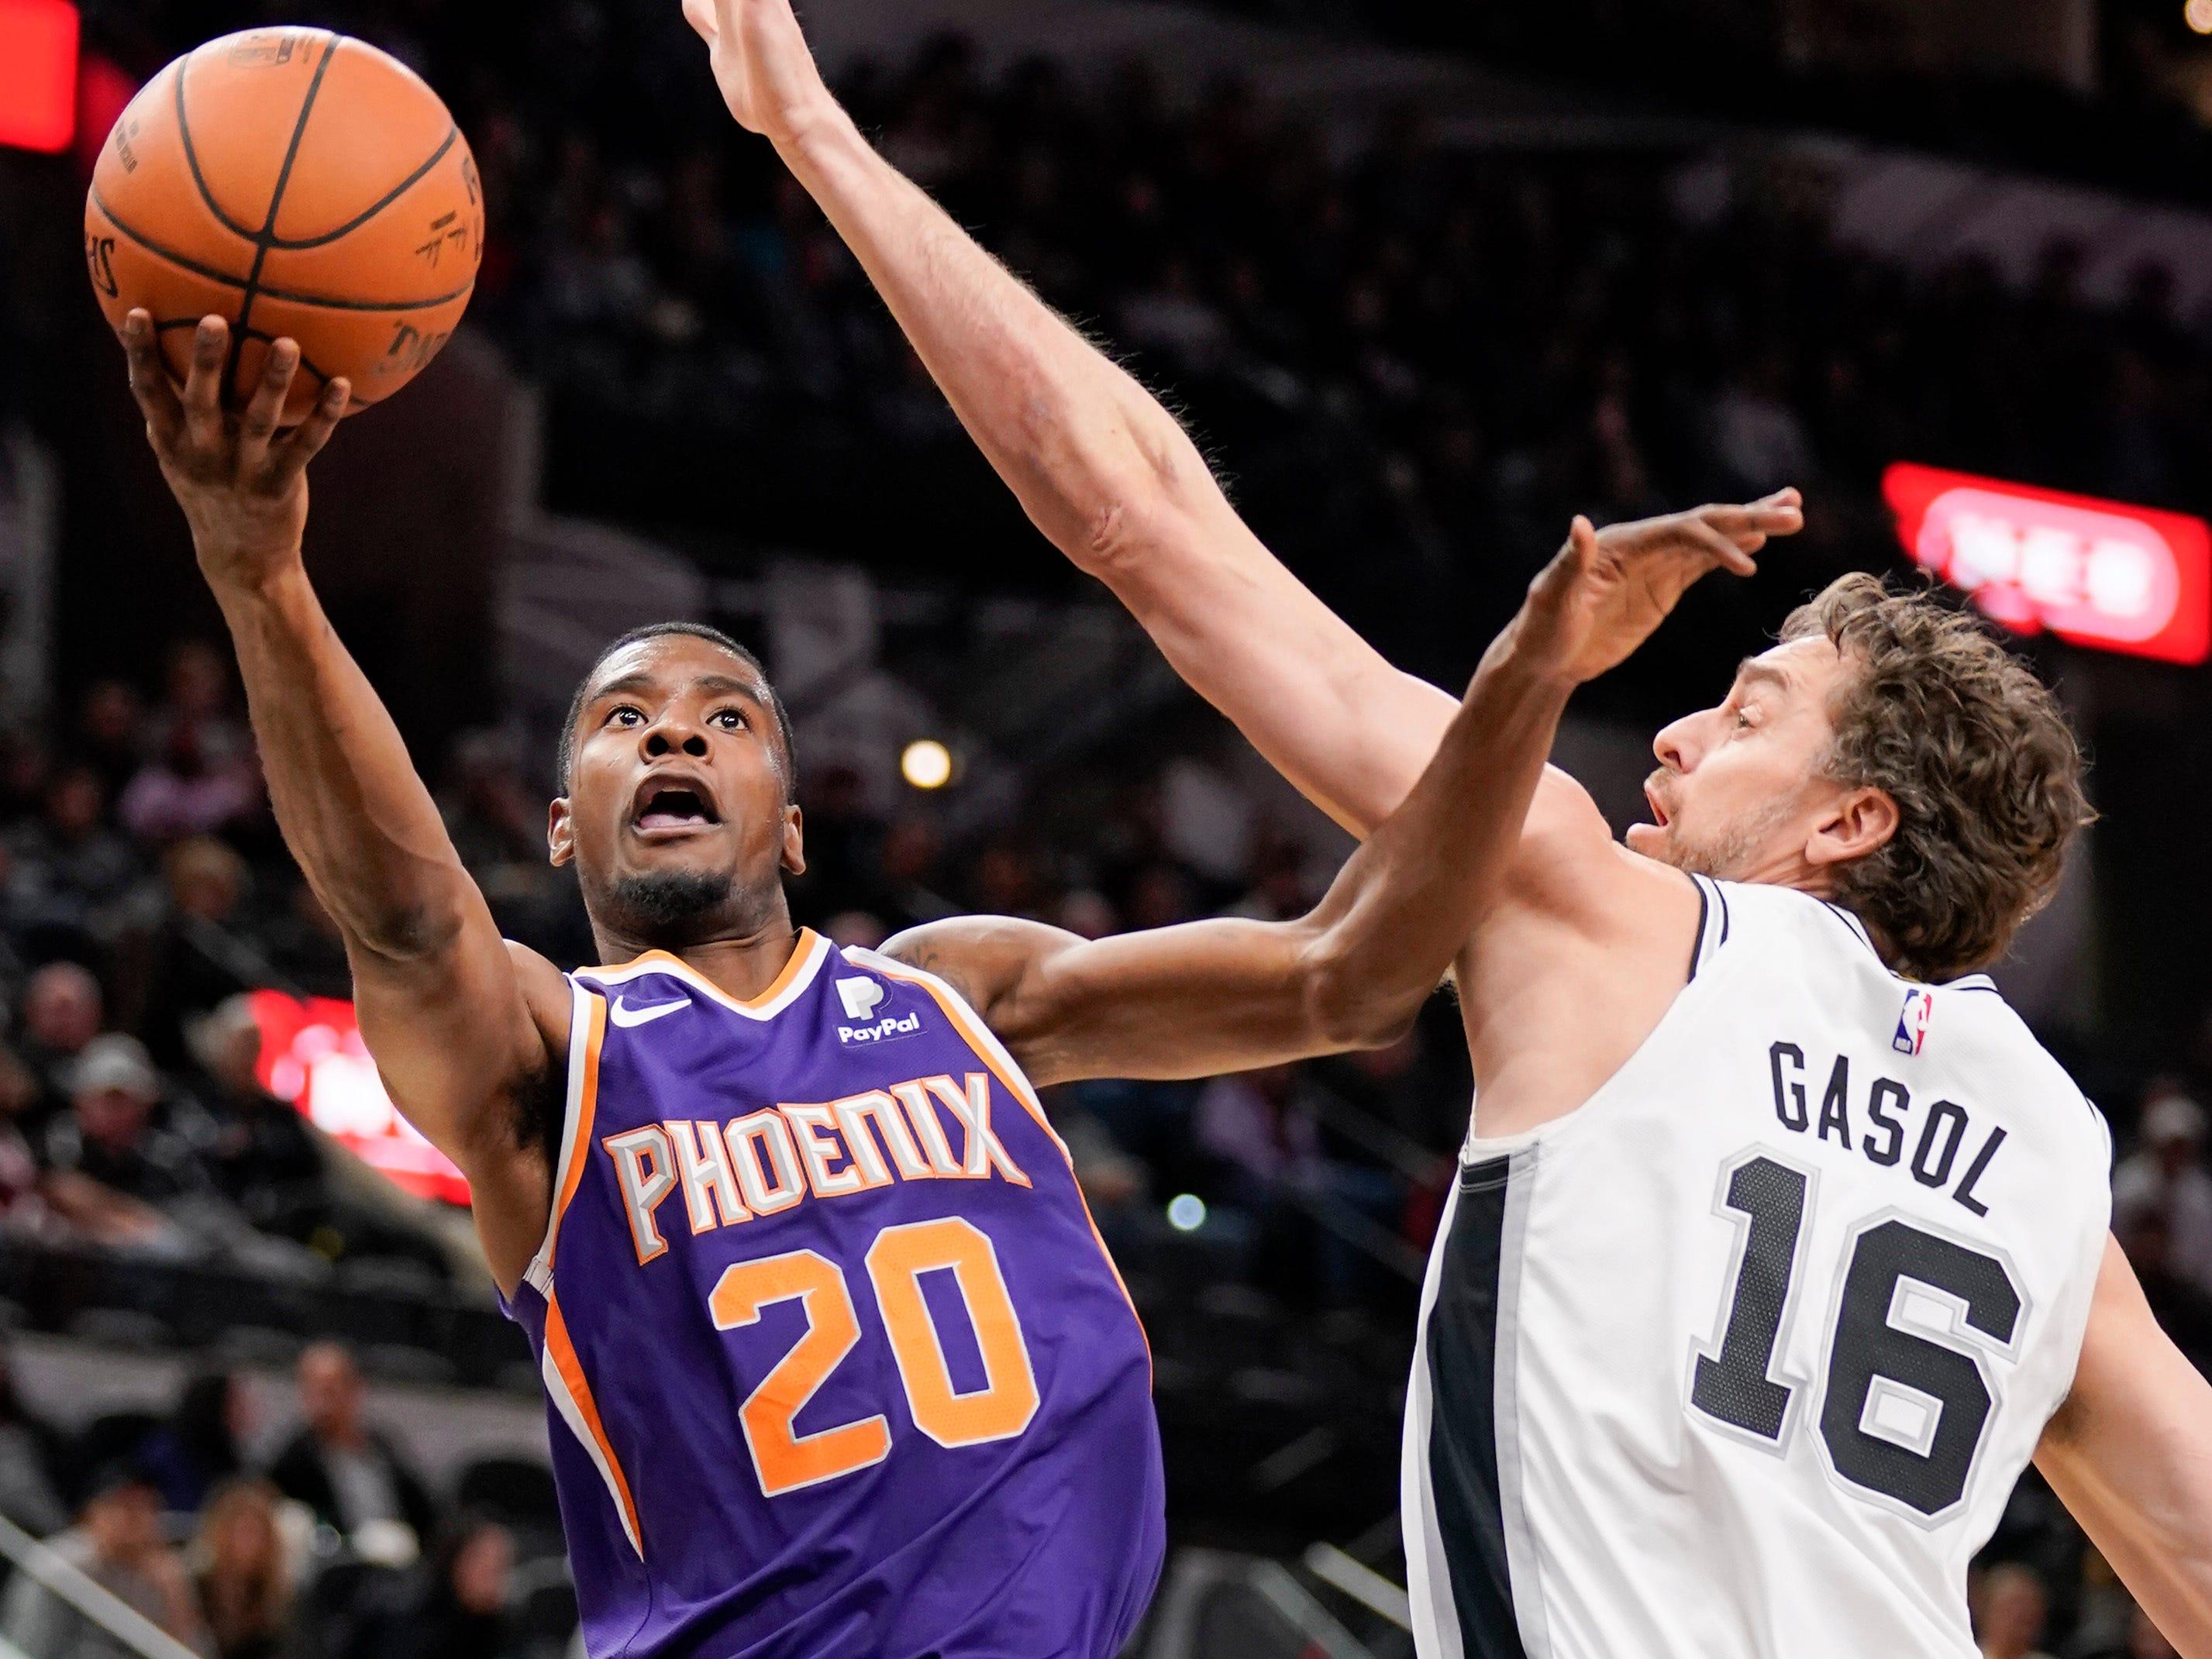 Phoenix Suns' Josh Jackson (20) shoots against San Antonio Spurs' Pau Gasol during the first half of an NBA basketball game, Tuesday, Jan. 29, 2019, in San Antonio.